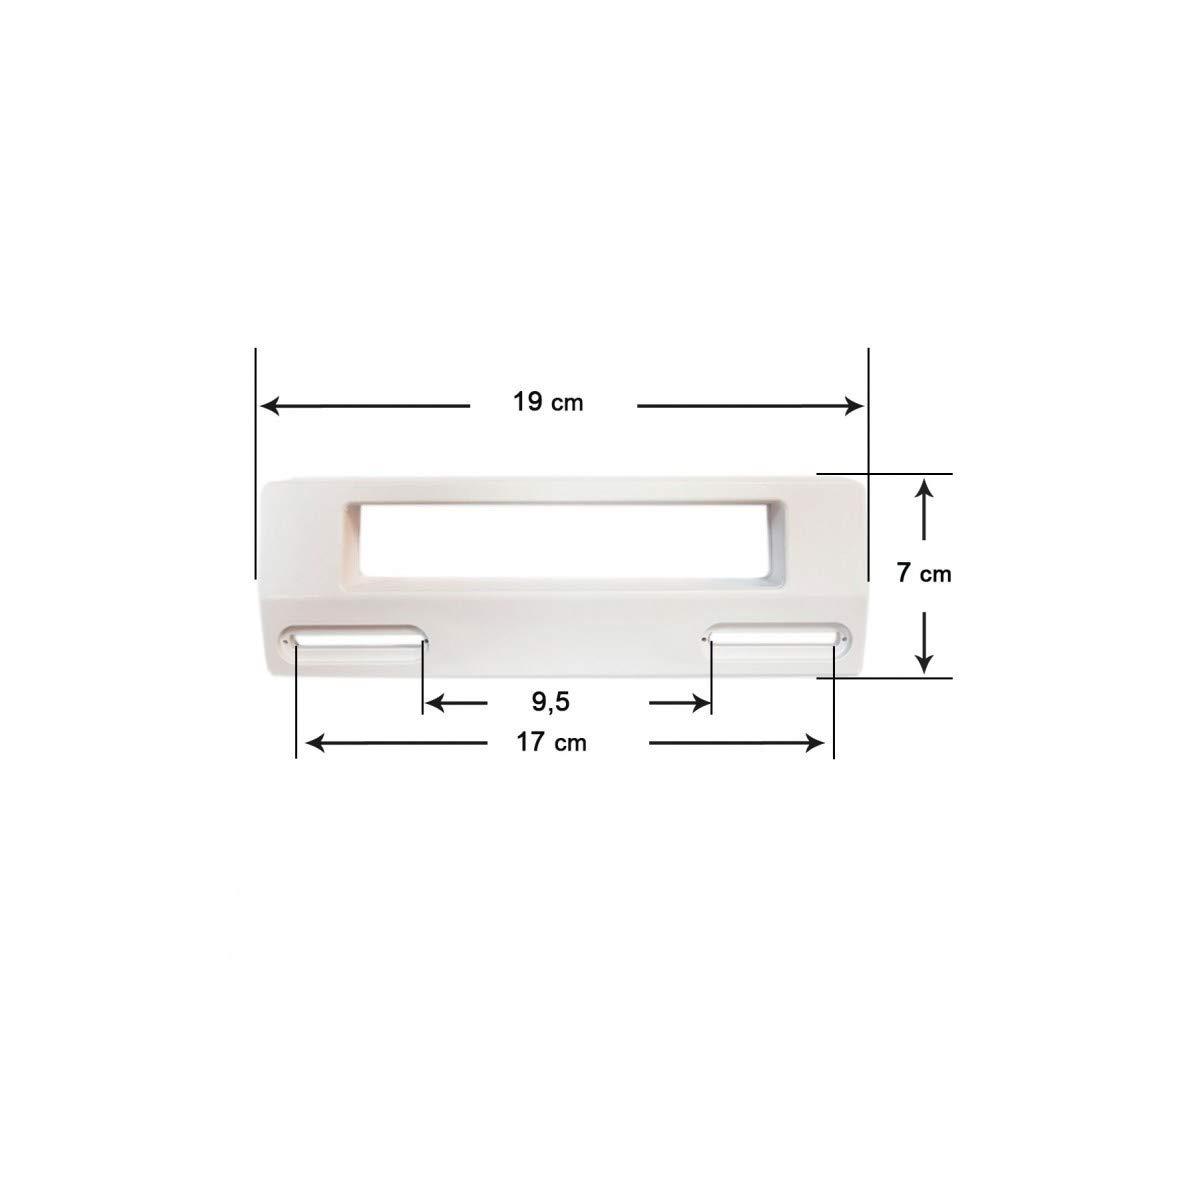 Recamania Tirador Blanco Puerta Frigorífico Universal 19x7 cm ...